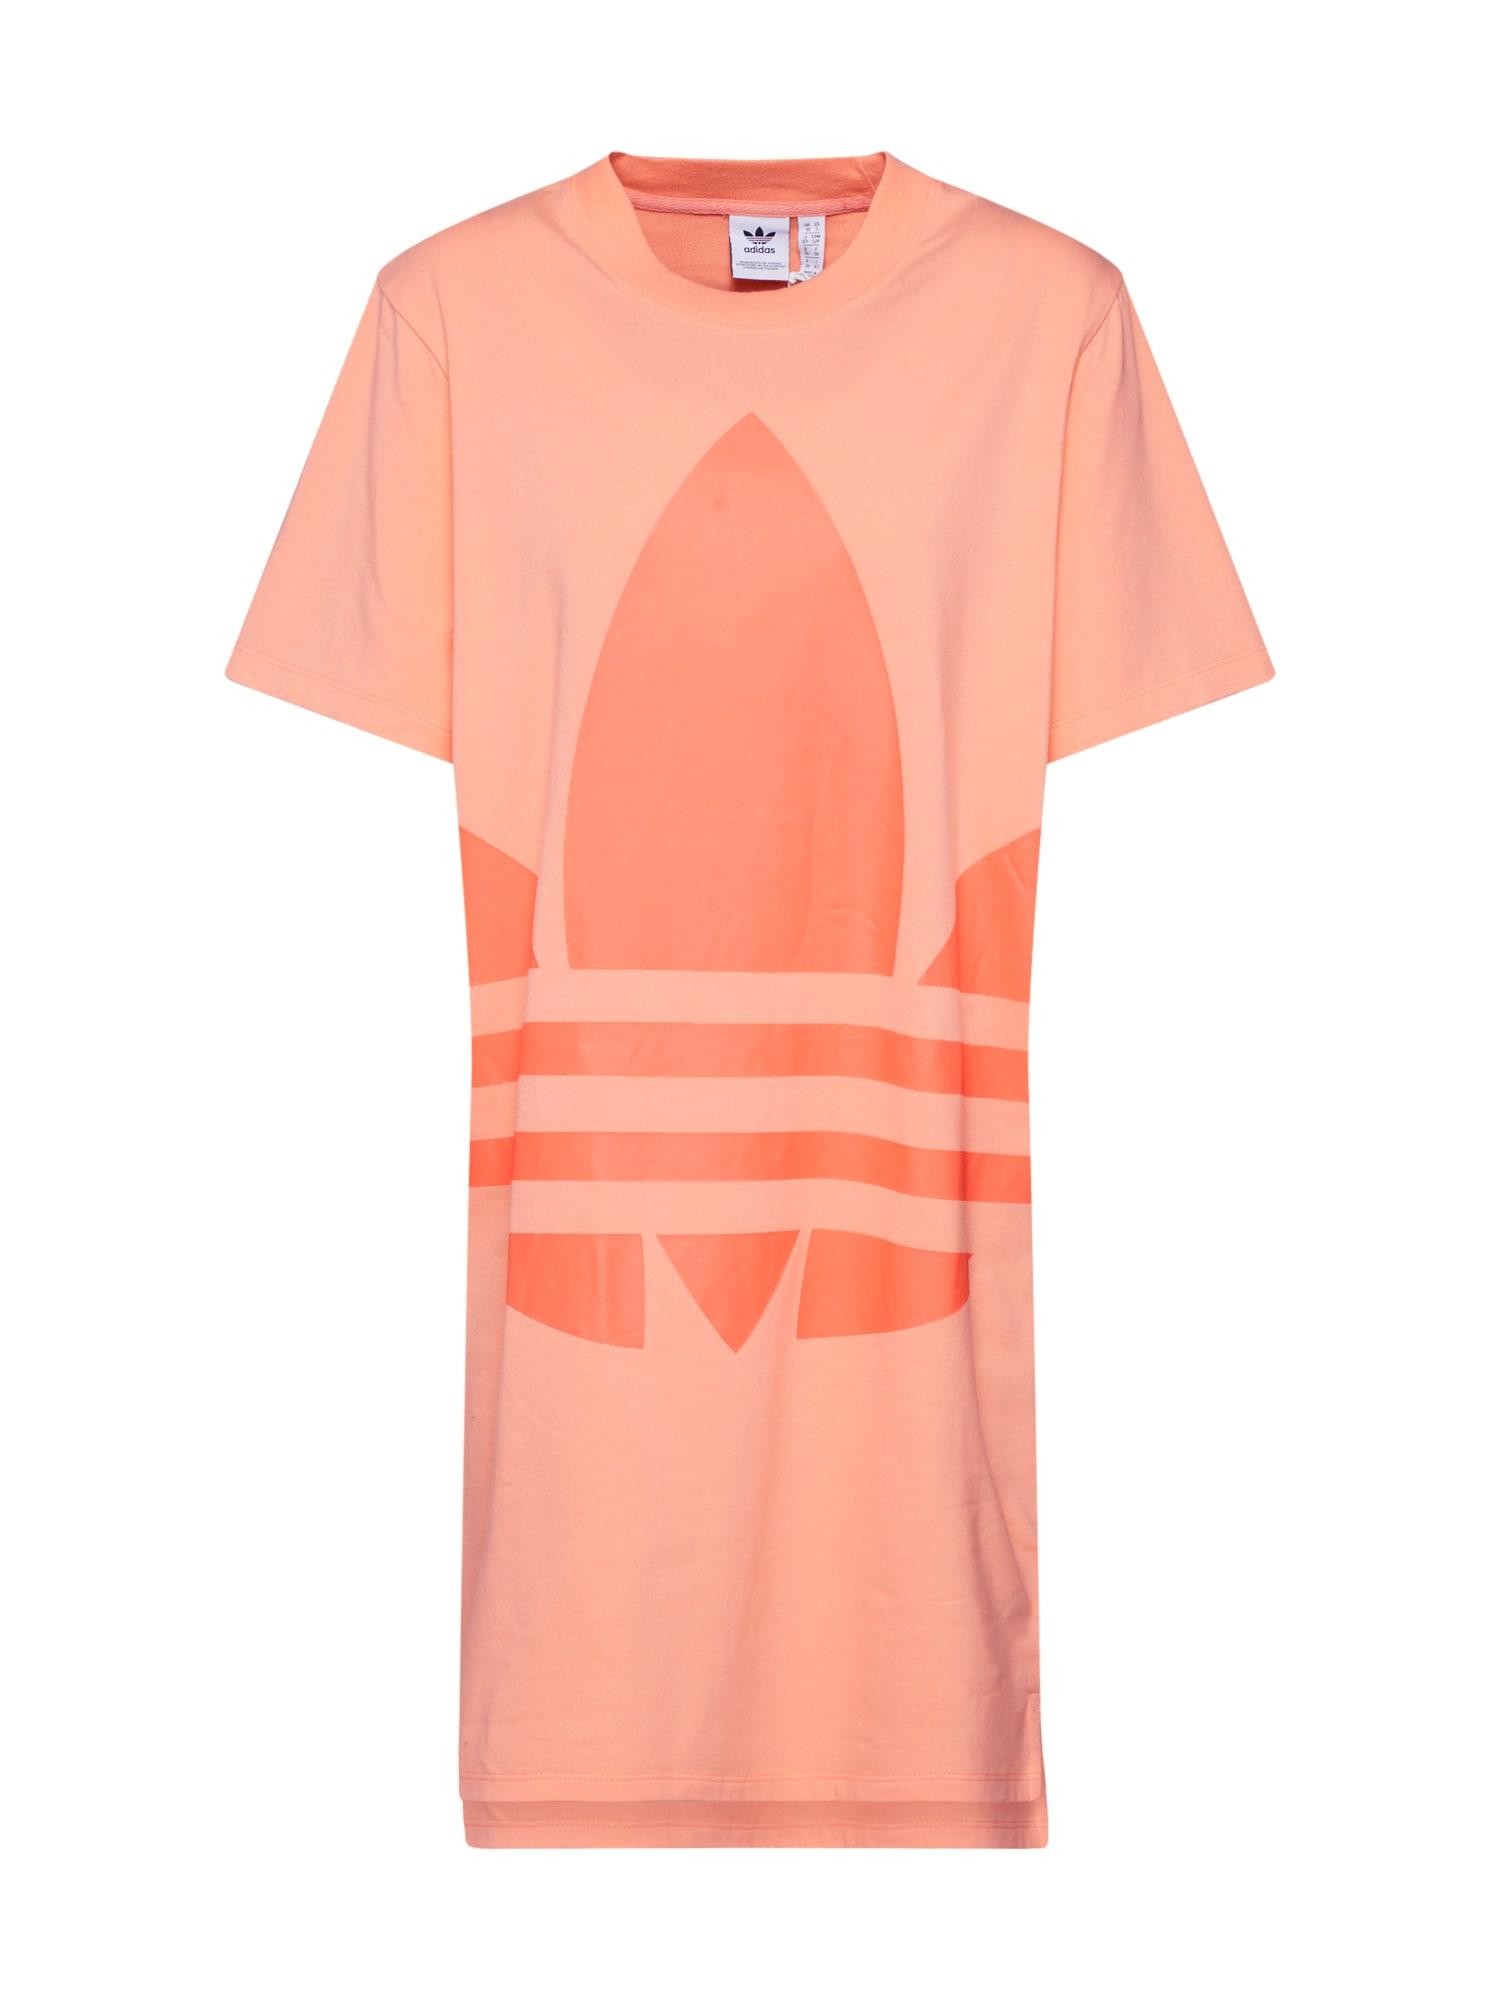 Kleoder Guru adidas Originals